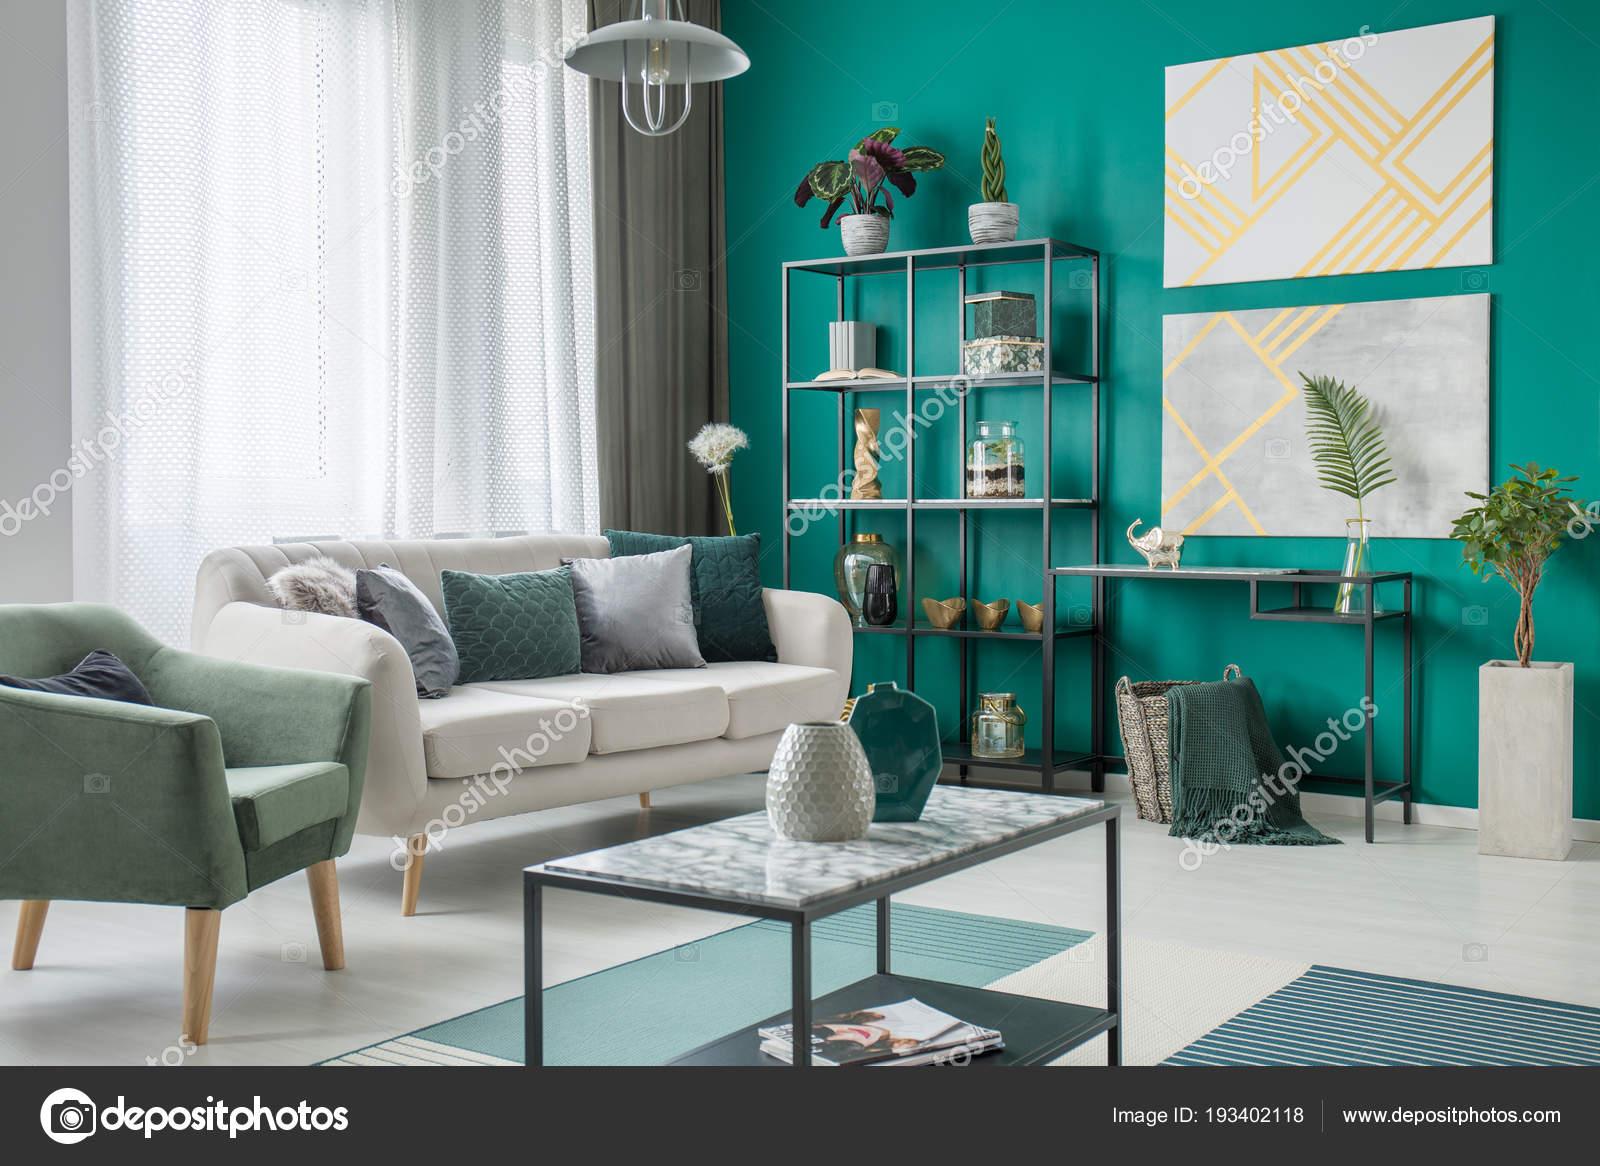 Bright Sofa Many Pillows Standing Next Green Armchair Living Room U2014 Stock  Photo